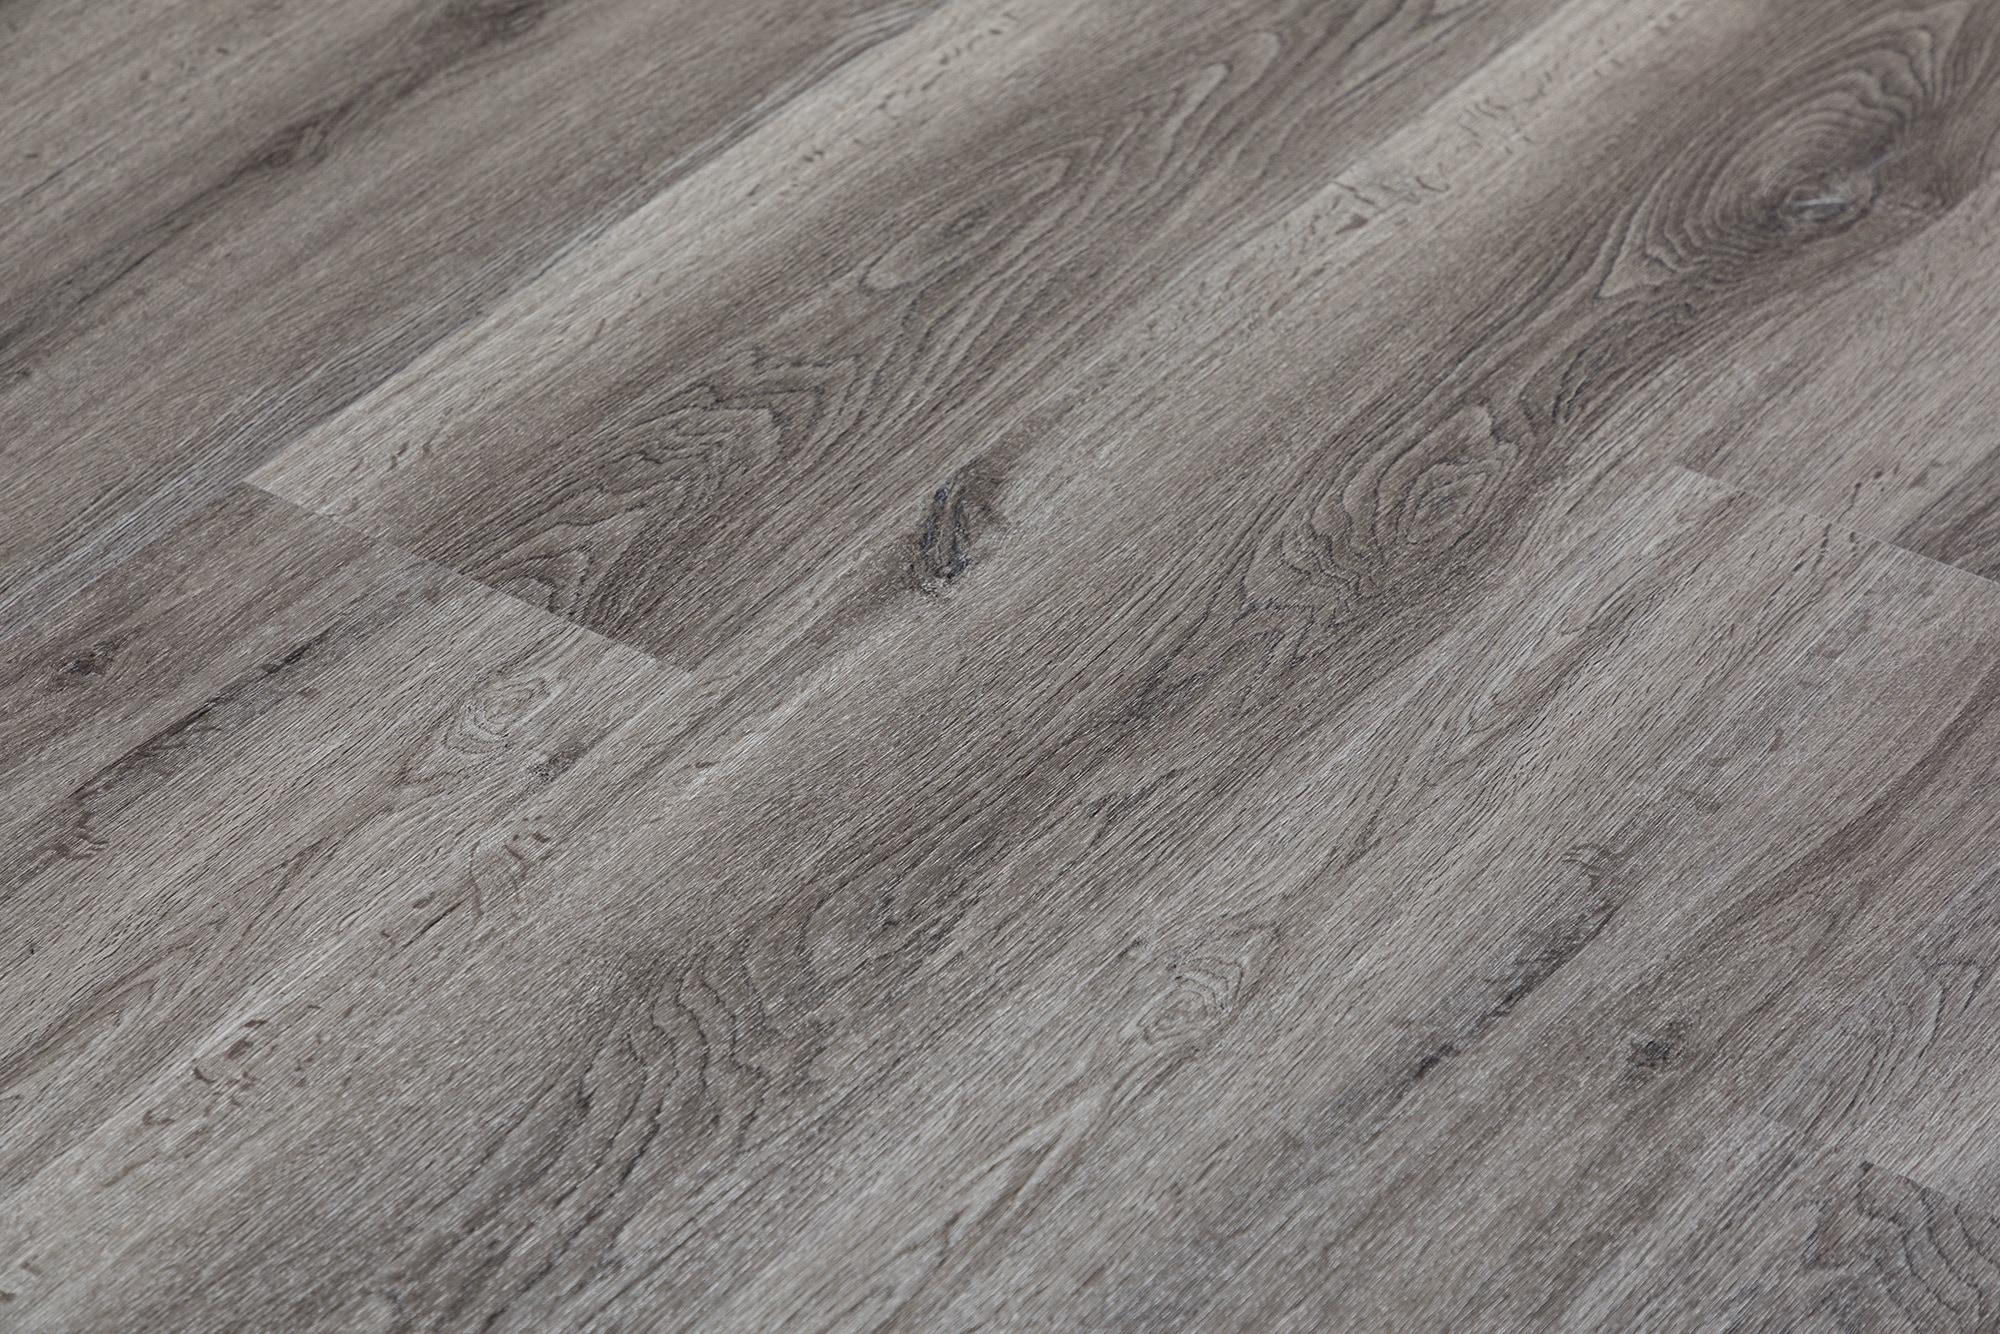 Stone Texture French Oak / 6.5mm / SPC / Click Lock Vinyl Planks - 6.5mm SPC Click Lock - XL Jumbo Collection 0